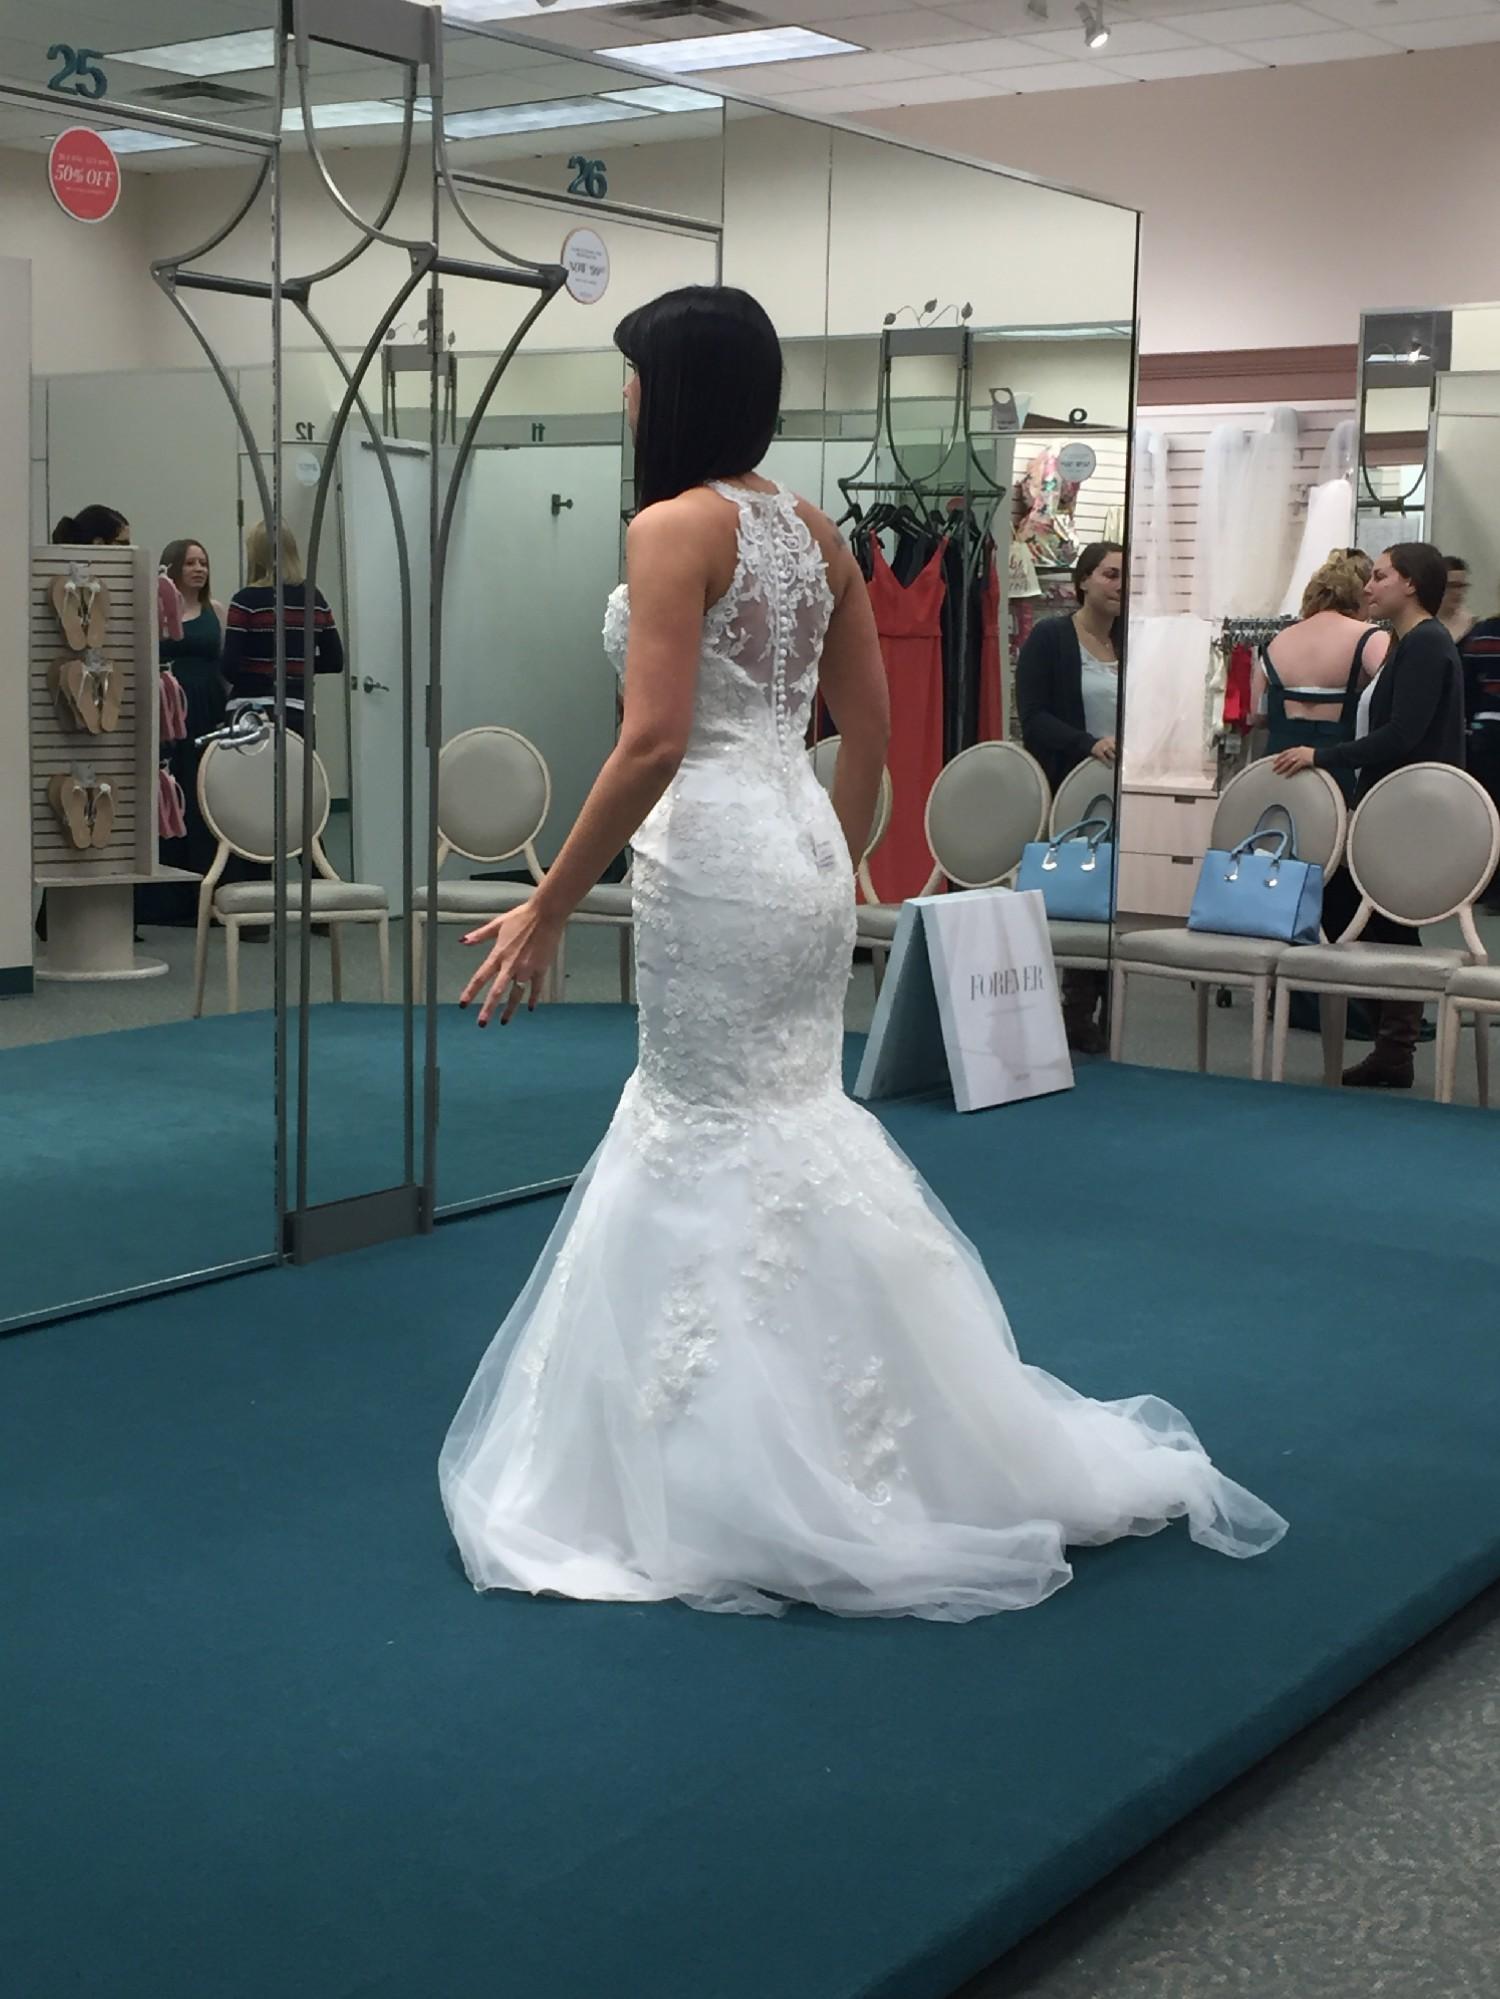 Jewel Wg3735 - New Wedding Dresses - Stillwhite